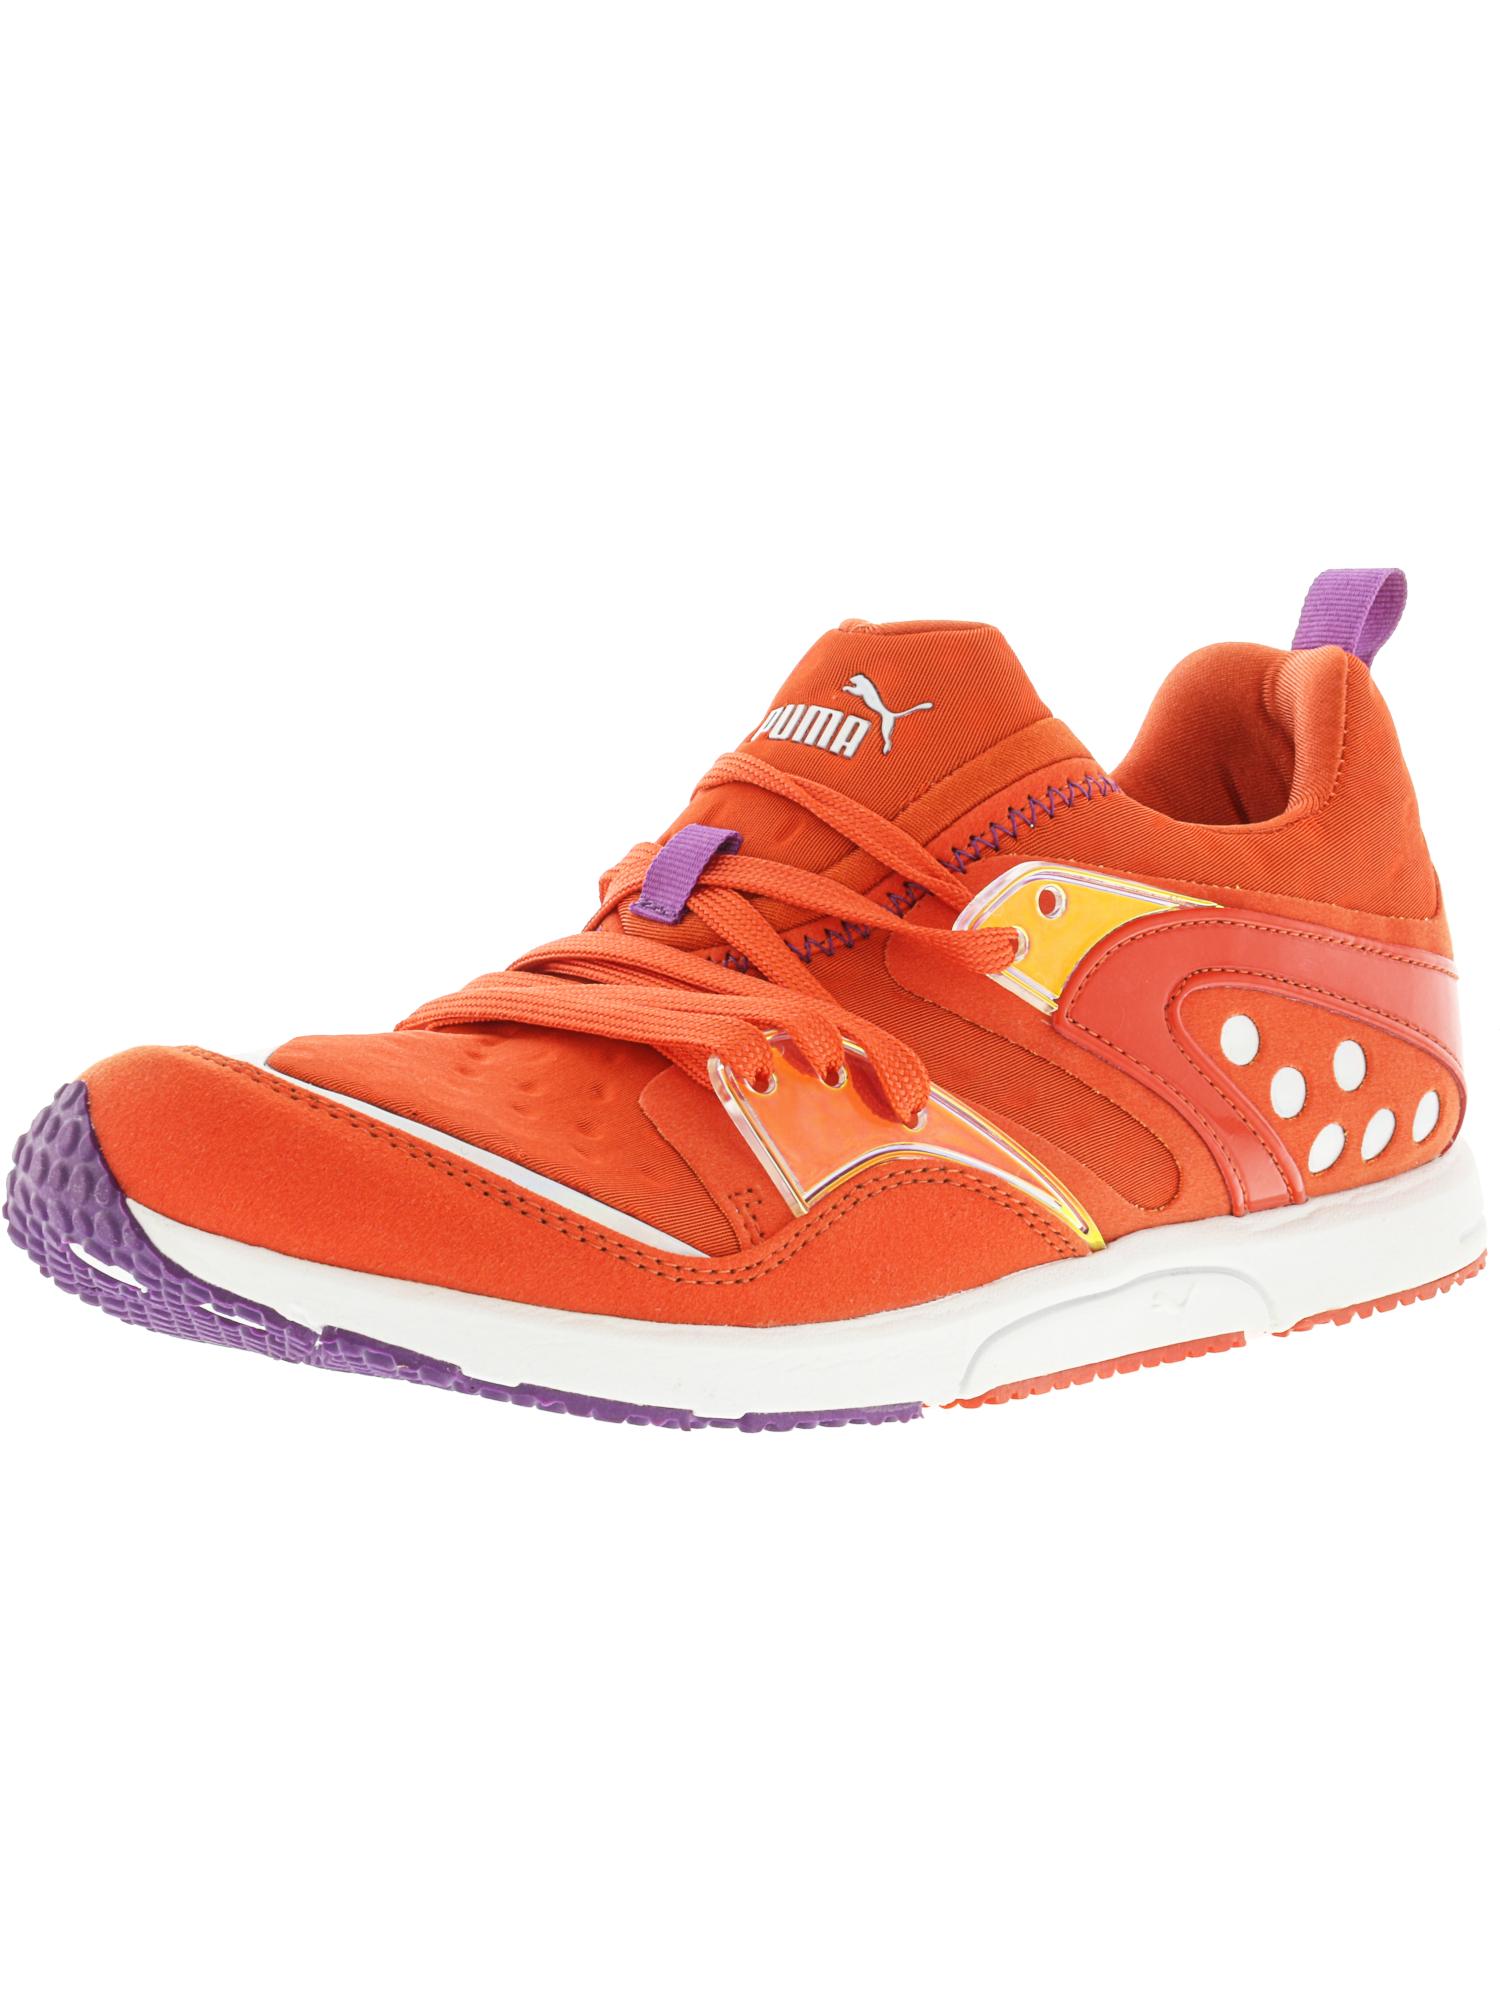 Puma-Women-039-s-Future-Blaze-Lite-Iridescent-Ankle-High-Fabric-Running-Shoe thumbnail 3